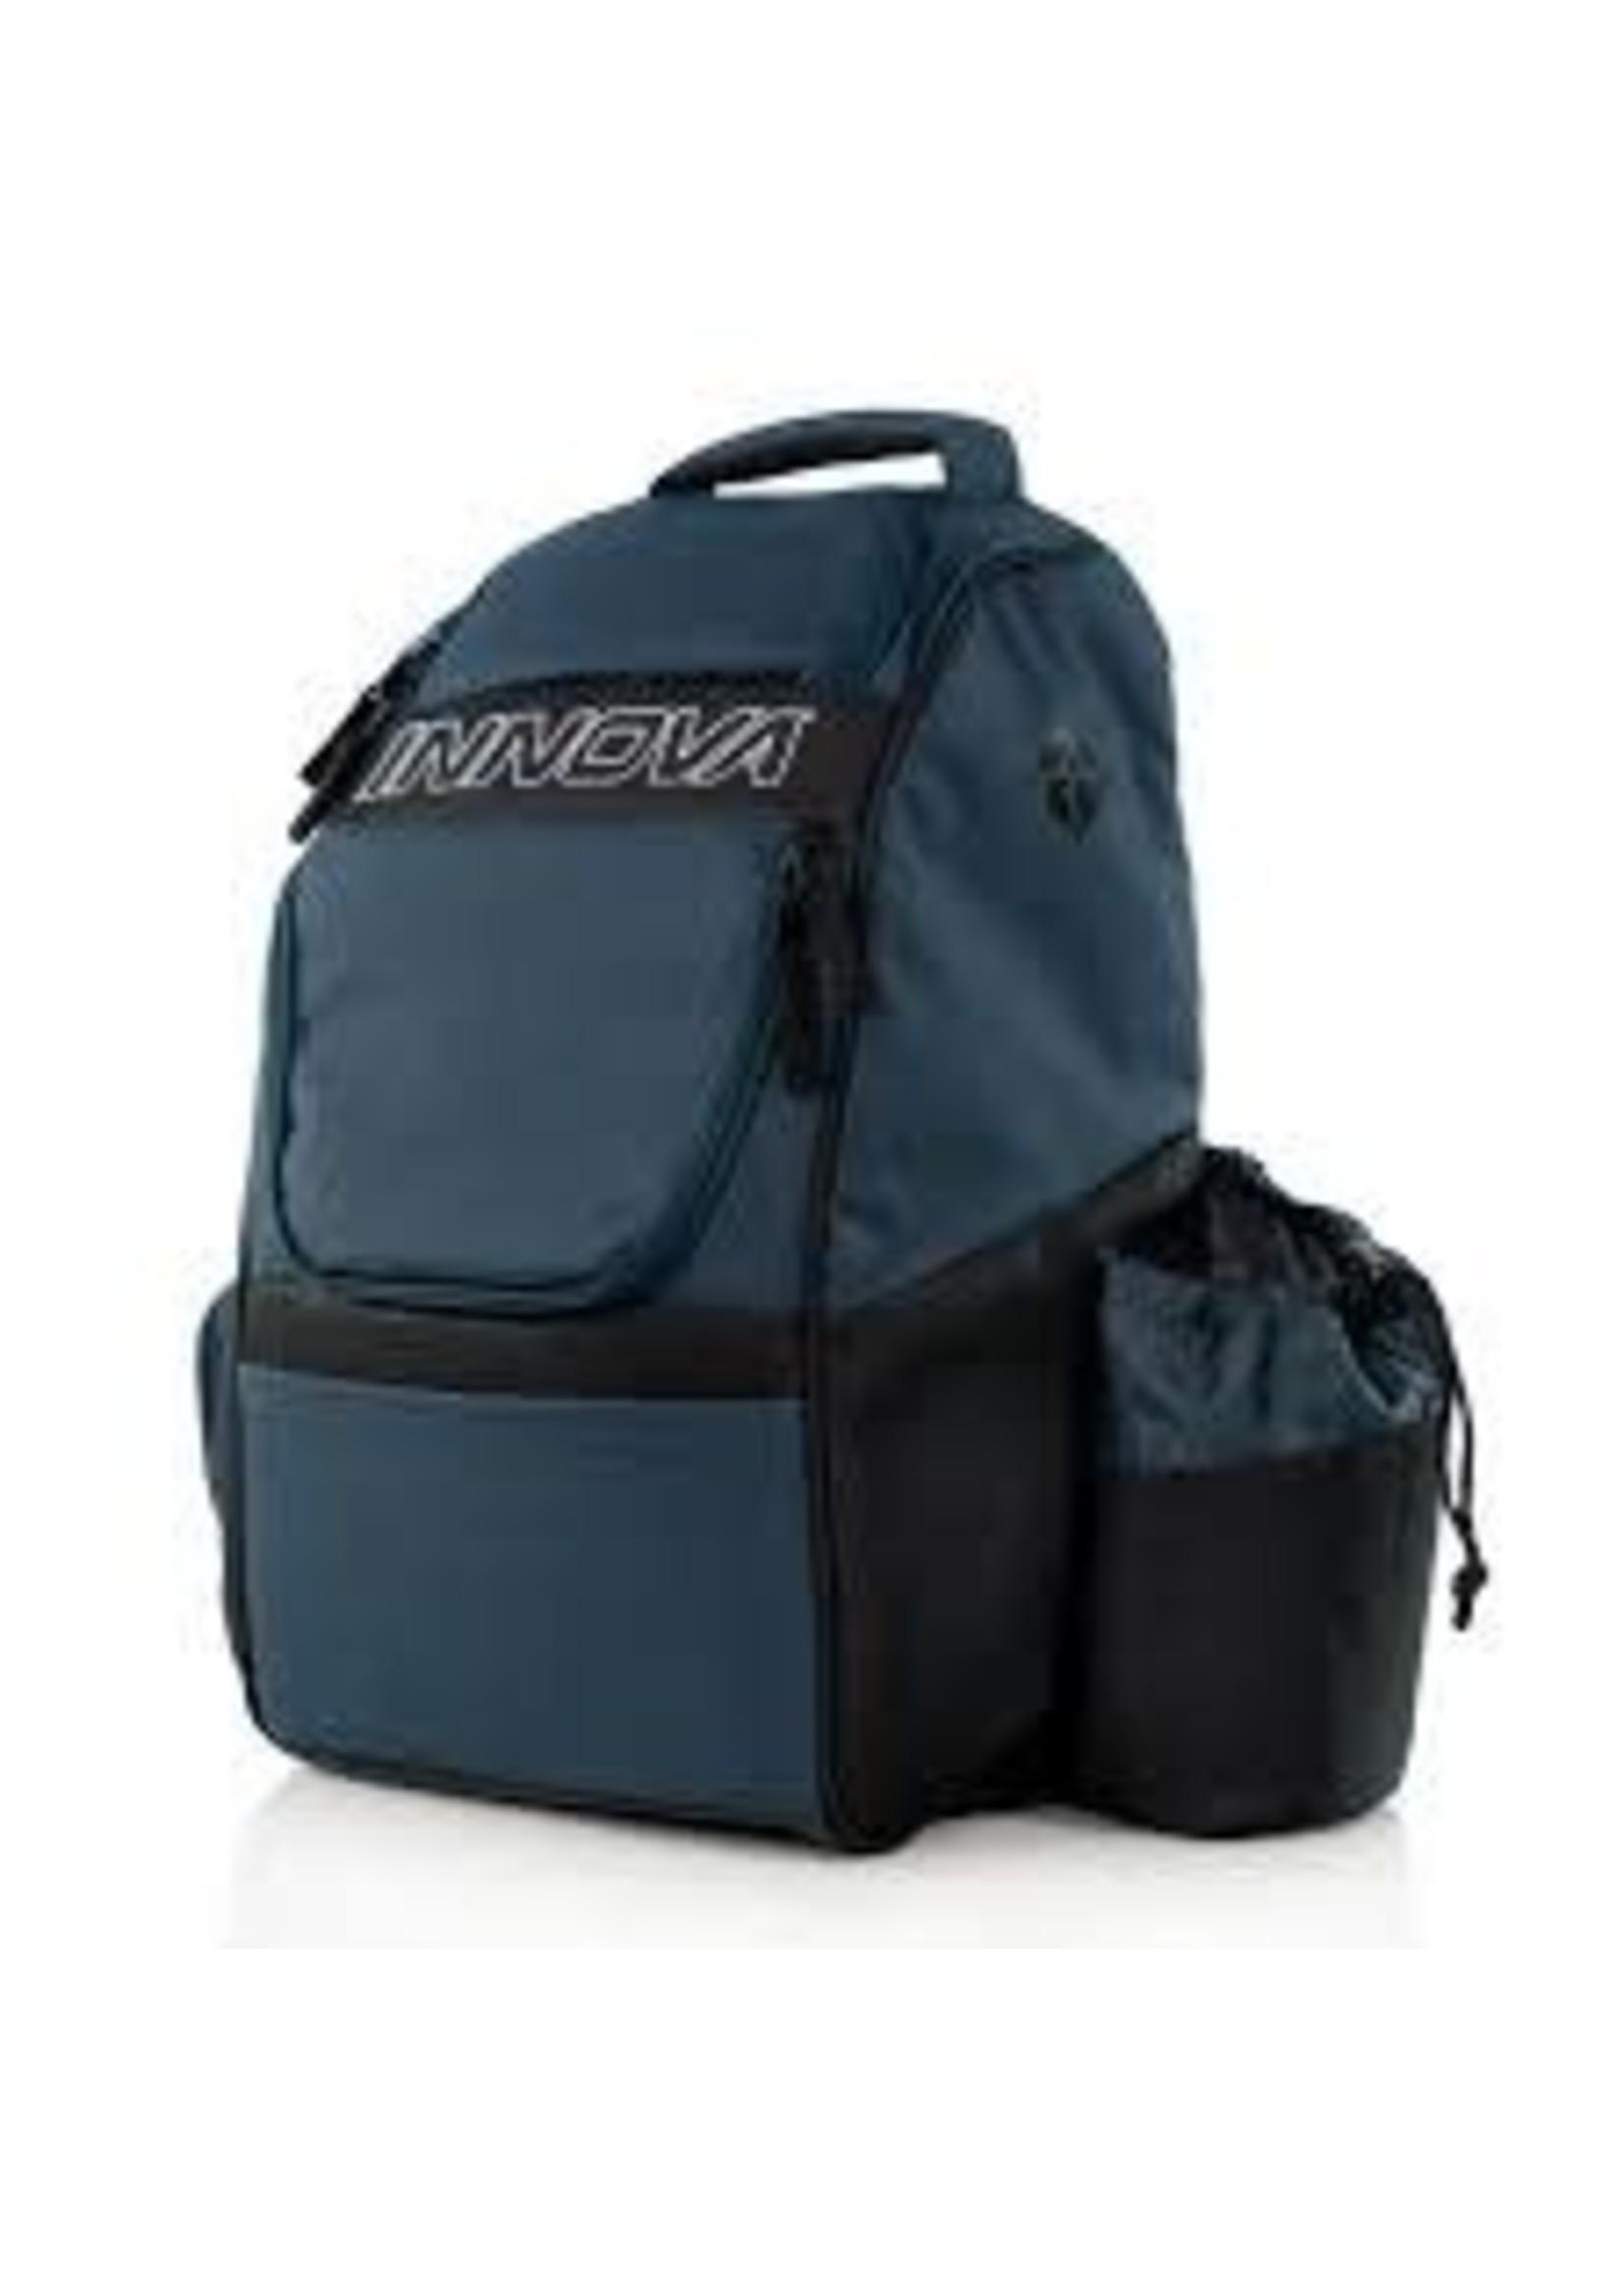 Innova Innova Adventure Disc Golf Backpack